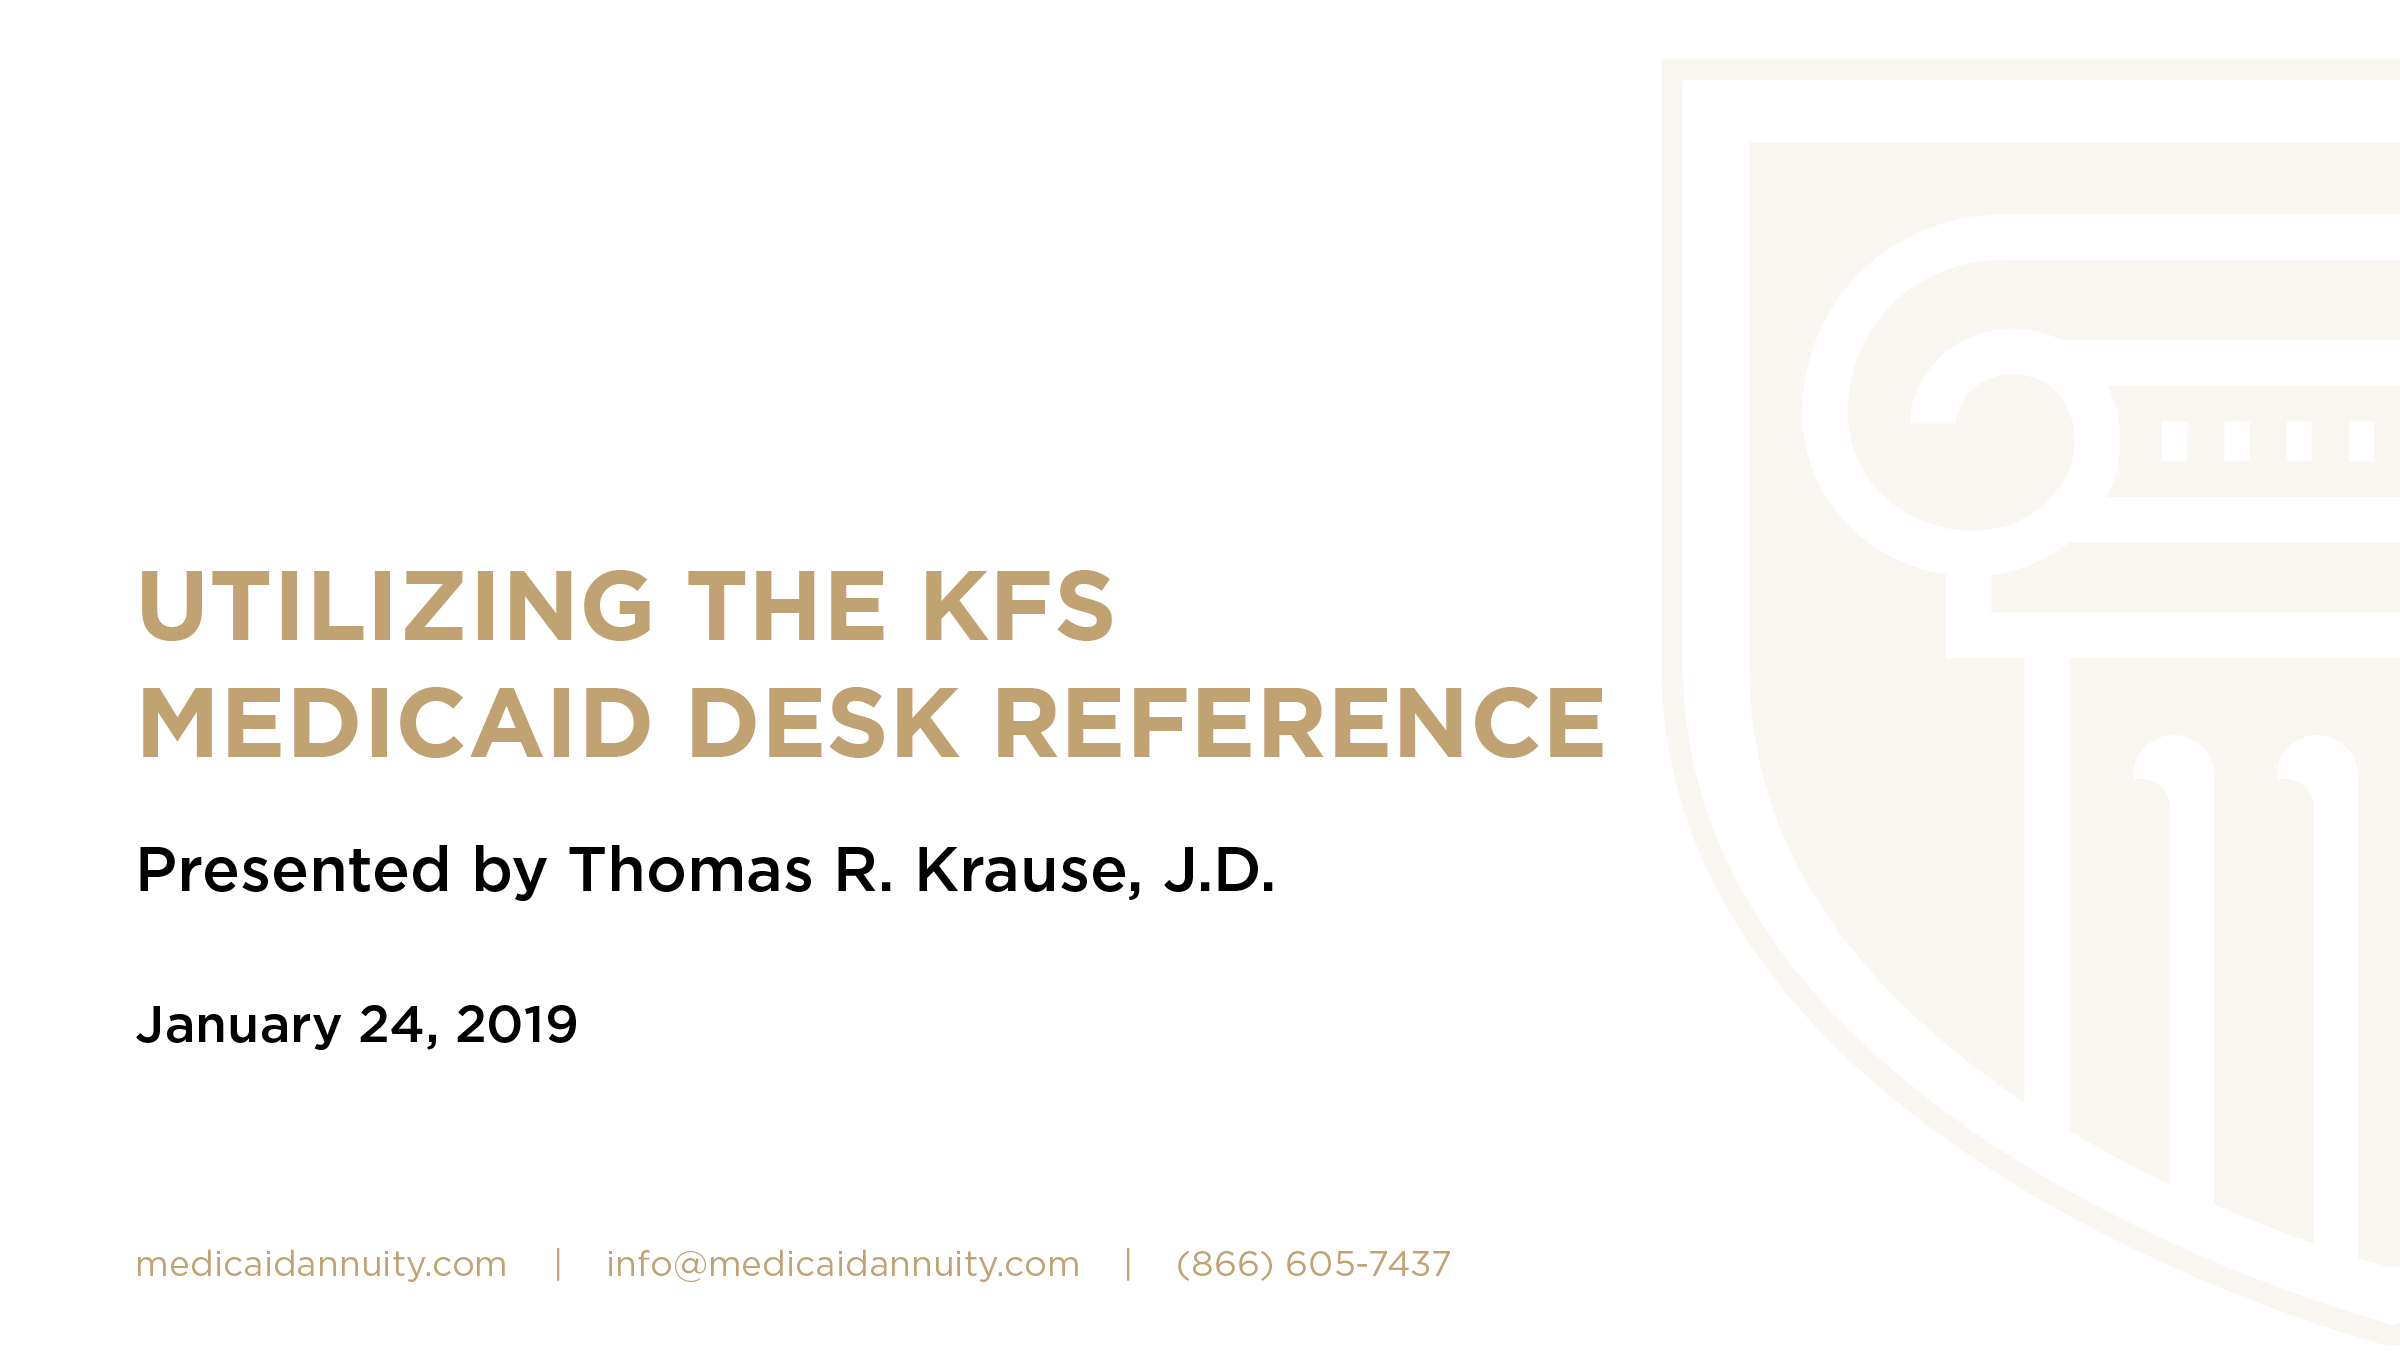 Utilizing the KFS Medicaid Desk Reference